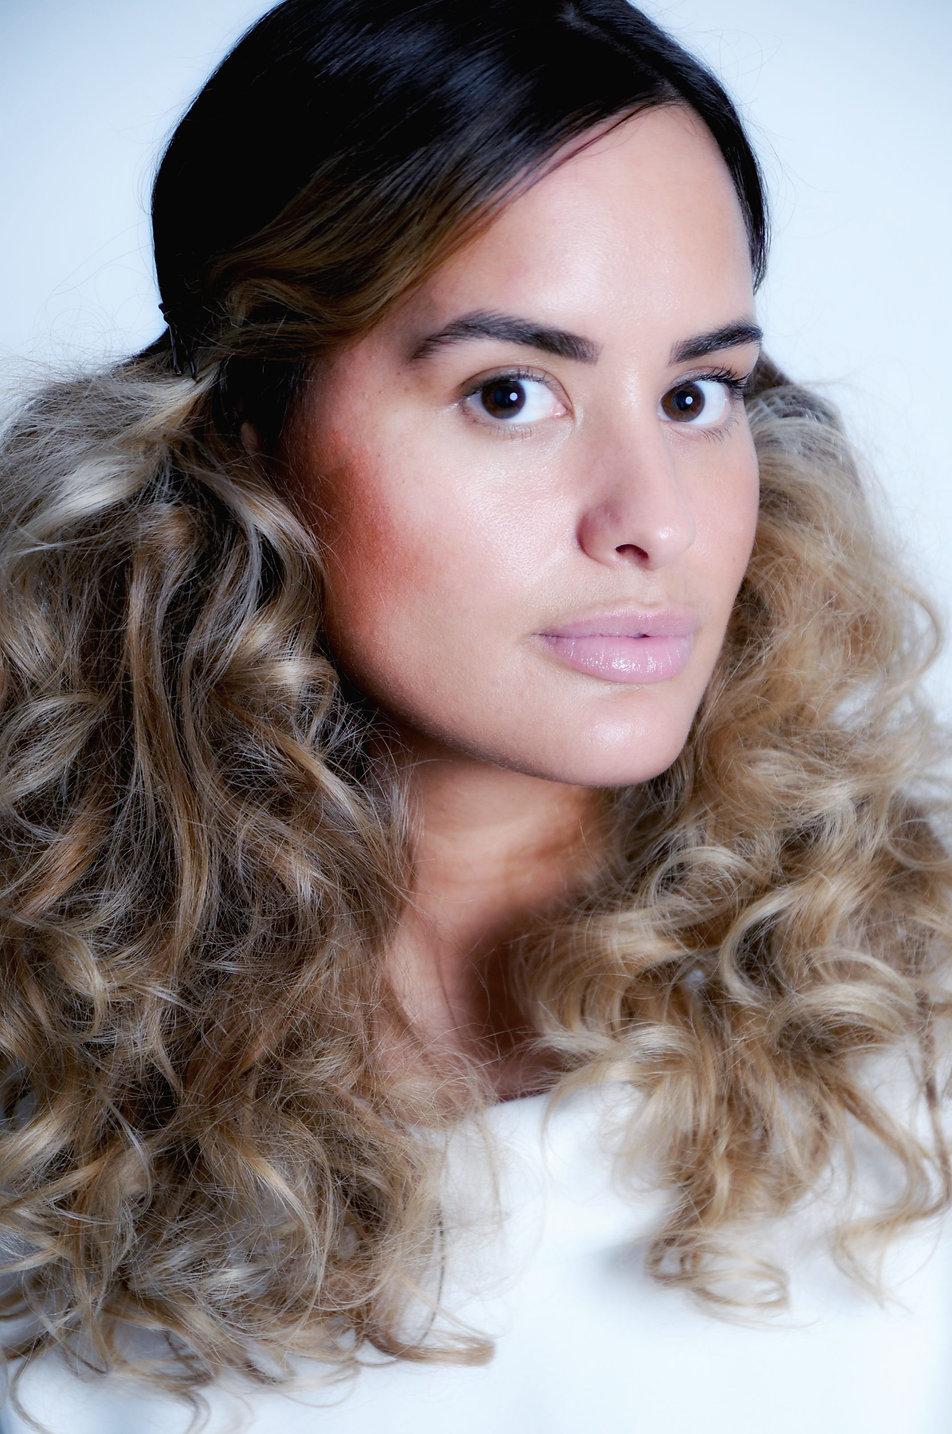 02 Fran close up curly hair.jpg